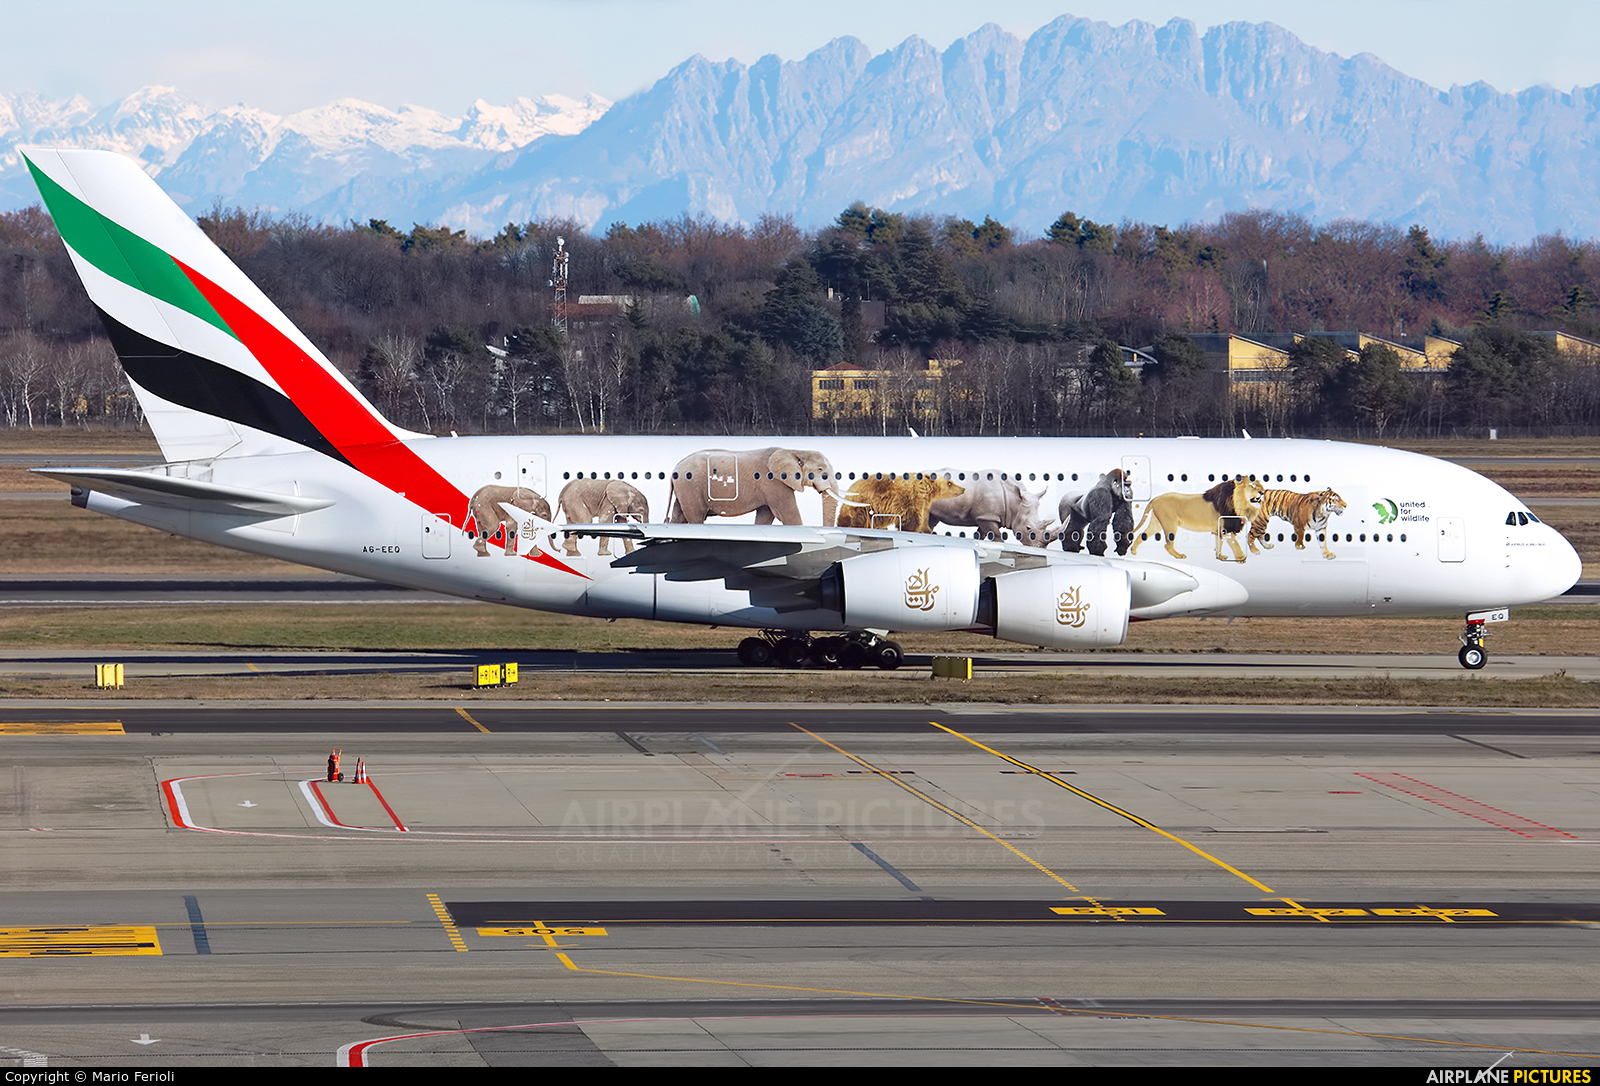 Emirates Airlines A6-EEQ aircraft at Milan - Malpensa